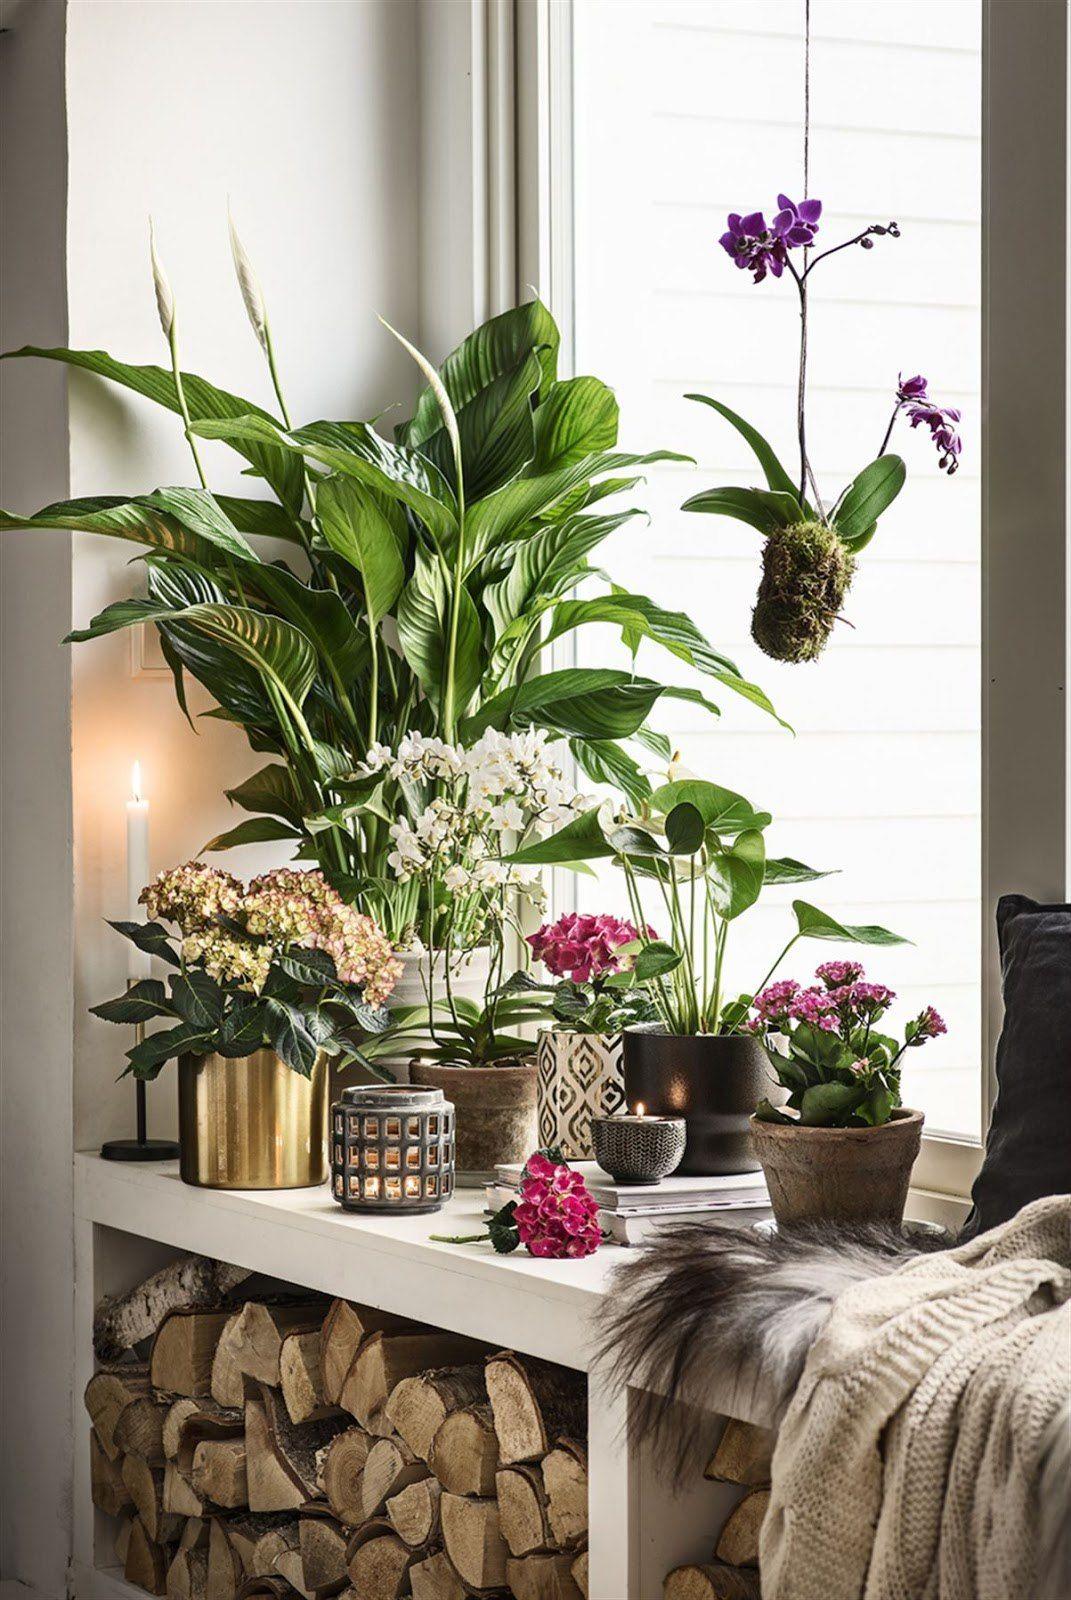 Картинки с растениями в квартире свои комментарии